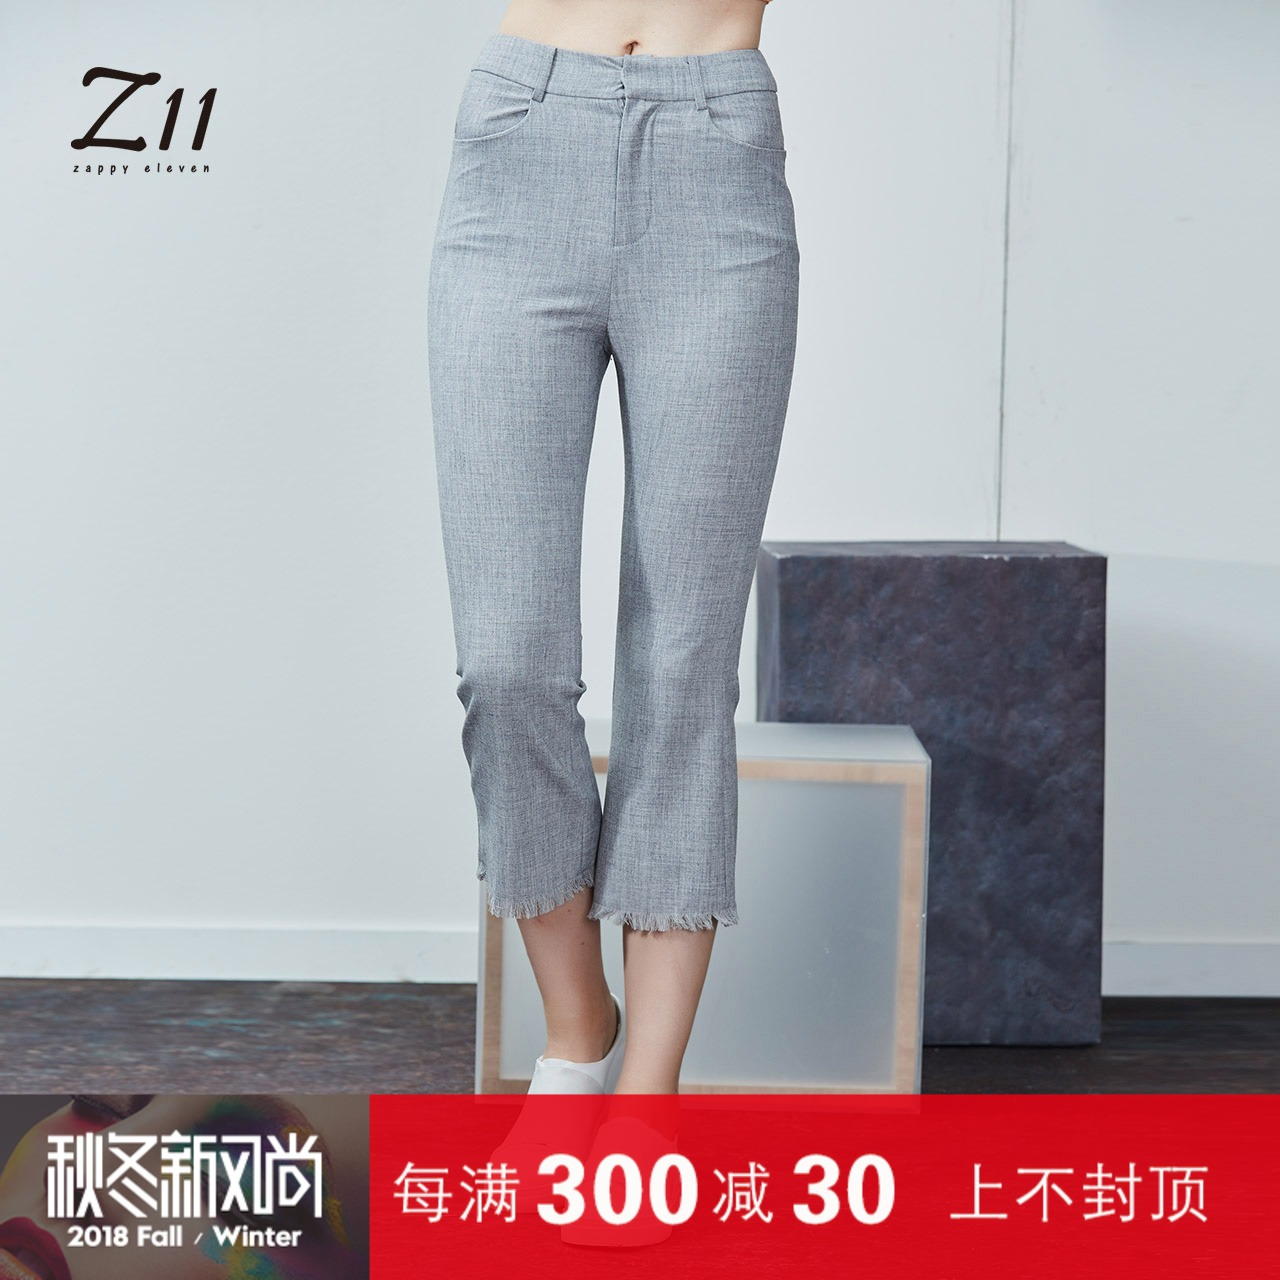 z11女装秋装休闲薄款格子毛边微喇叭高腰九分裤Z17AN536